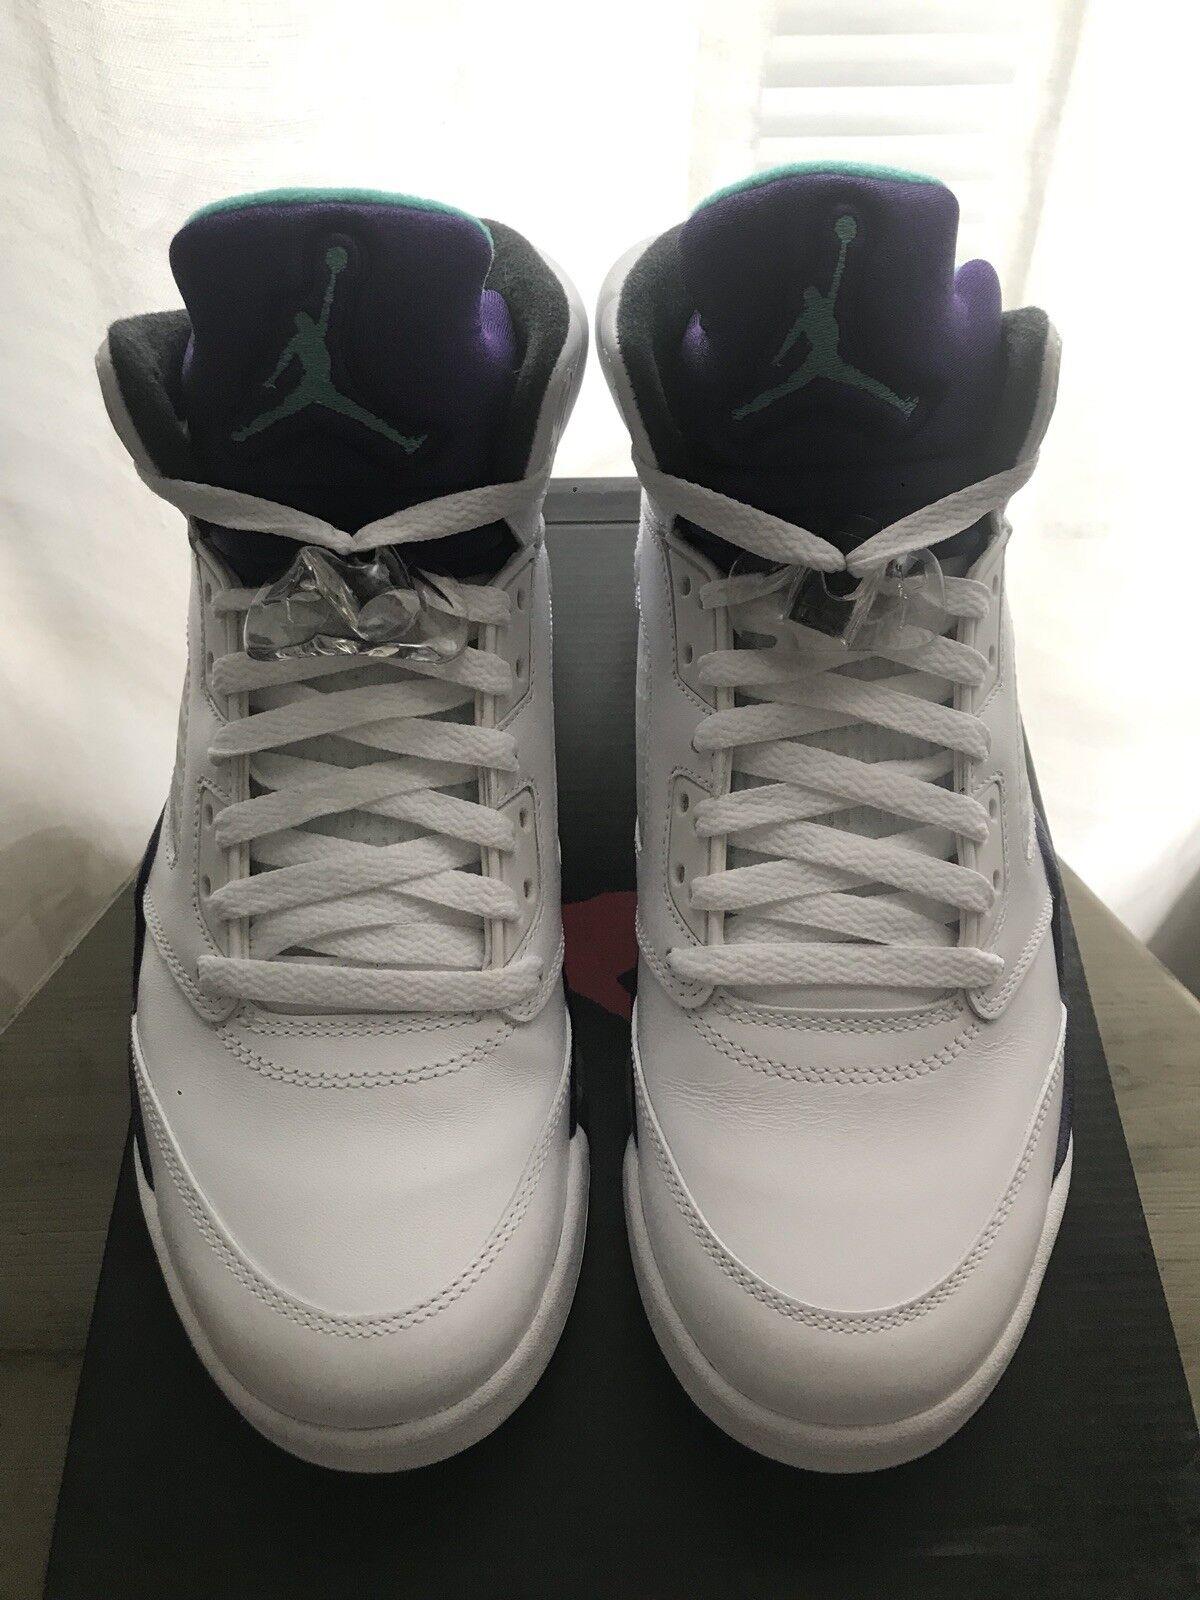 Nike Air Jordan 5 Retro White Grape Size 8